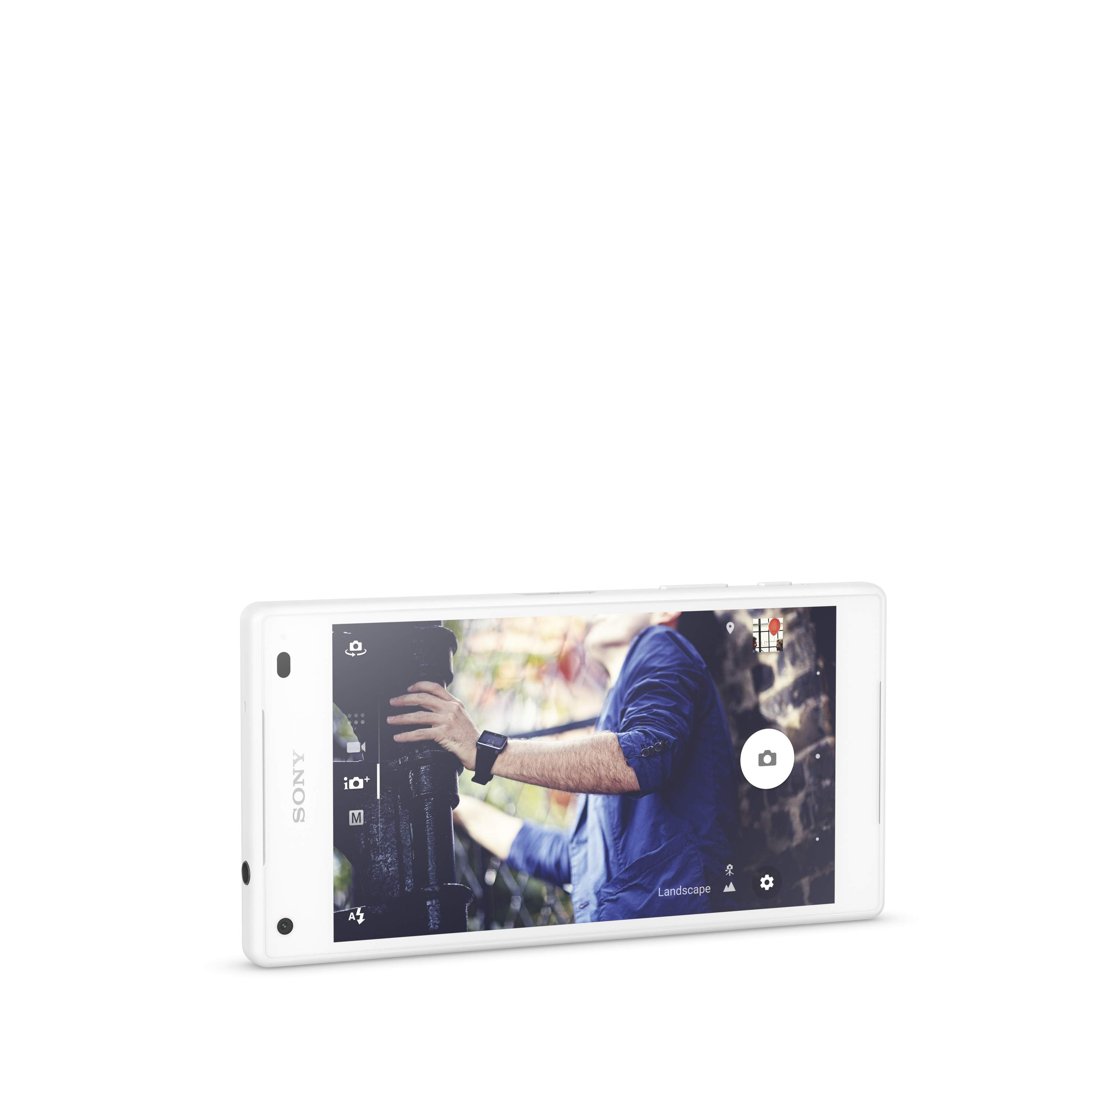 Z5 Compact White